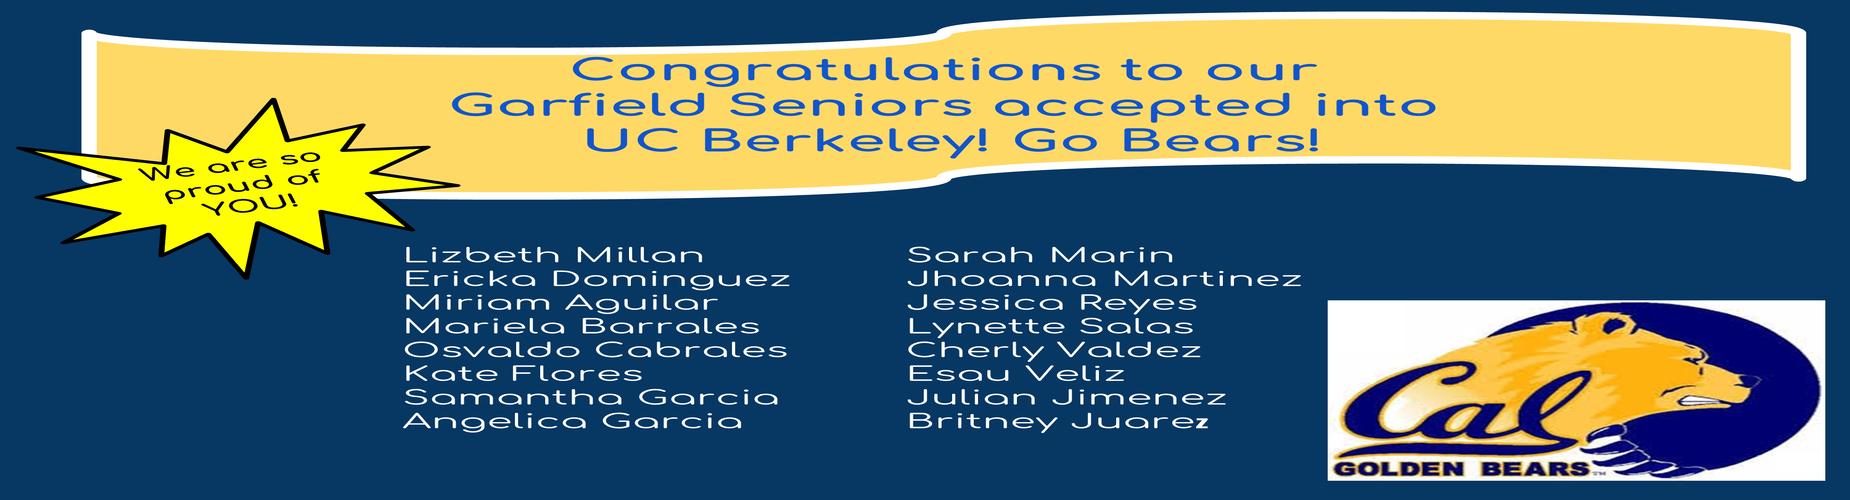 Congratulating Garfield Seniors Acceptance to UC Berkeley